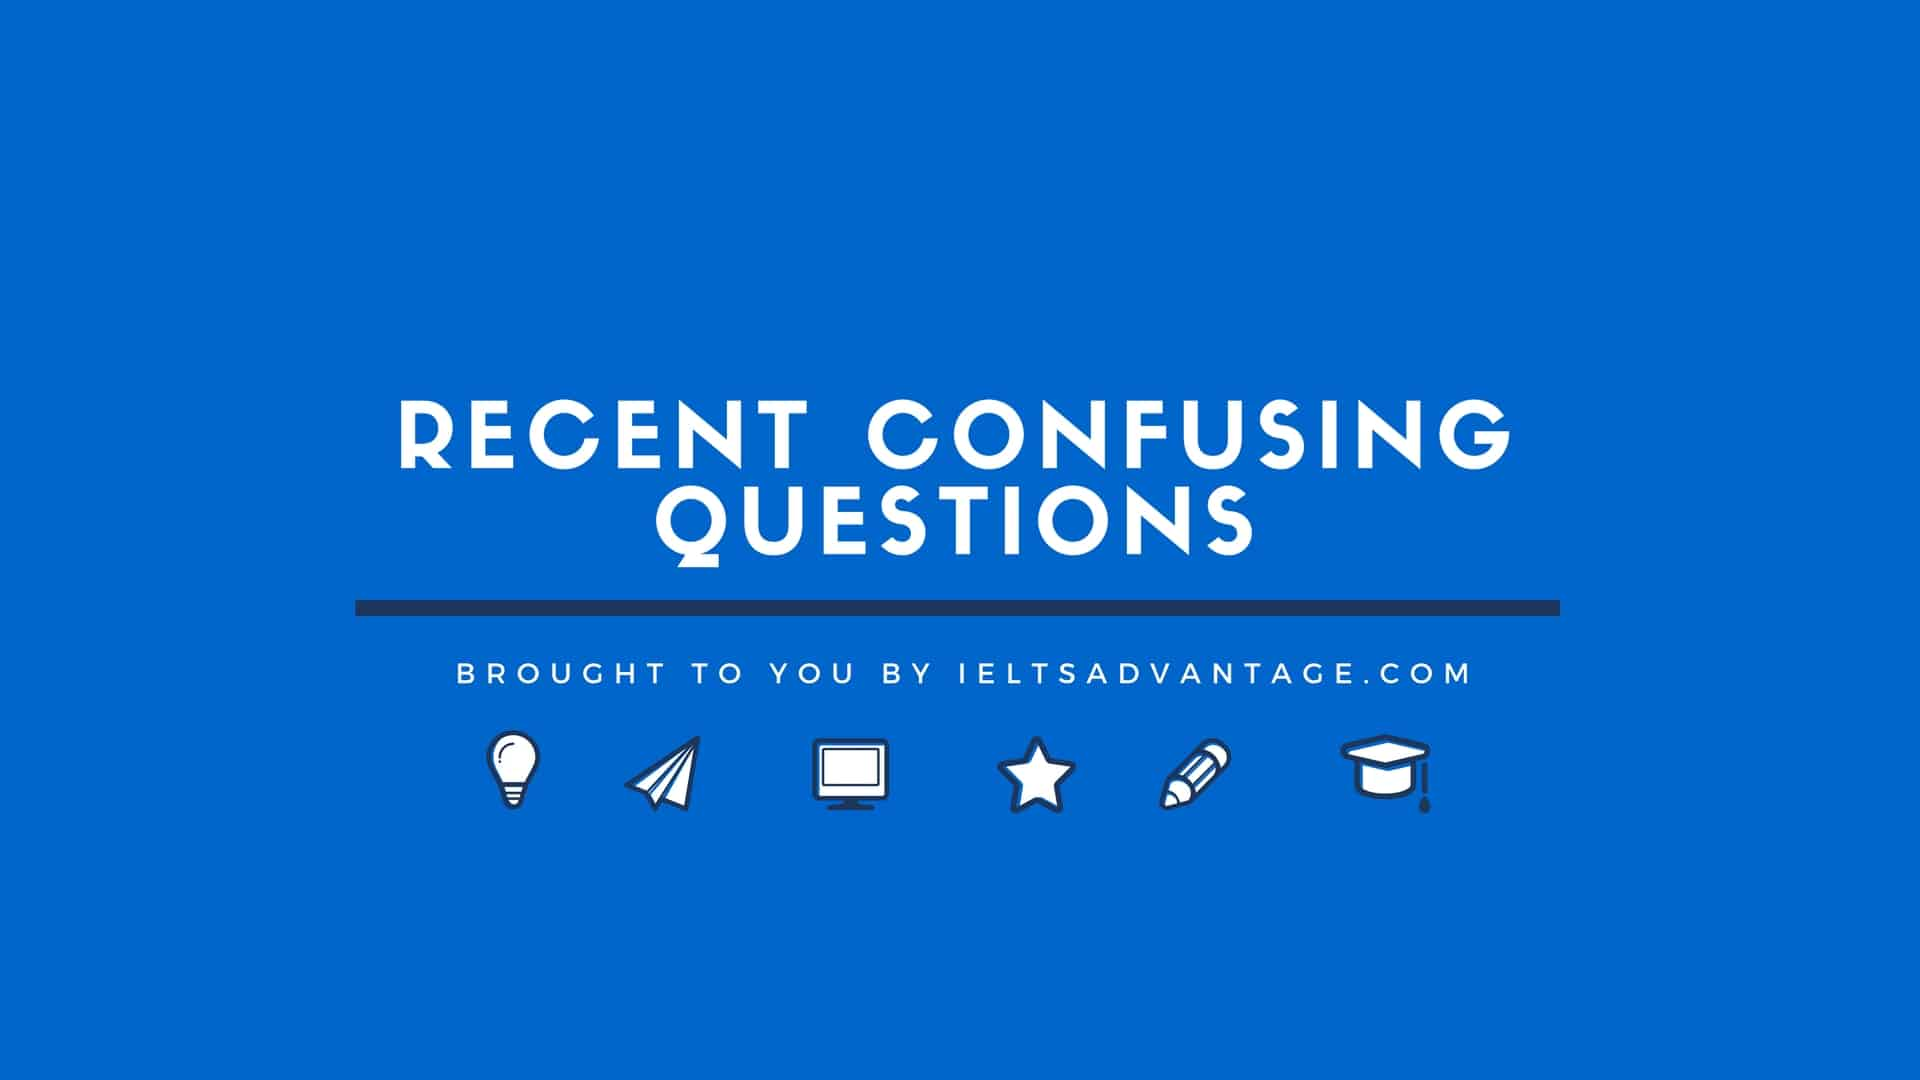 8 Recent Confusing Questions